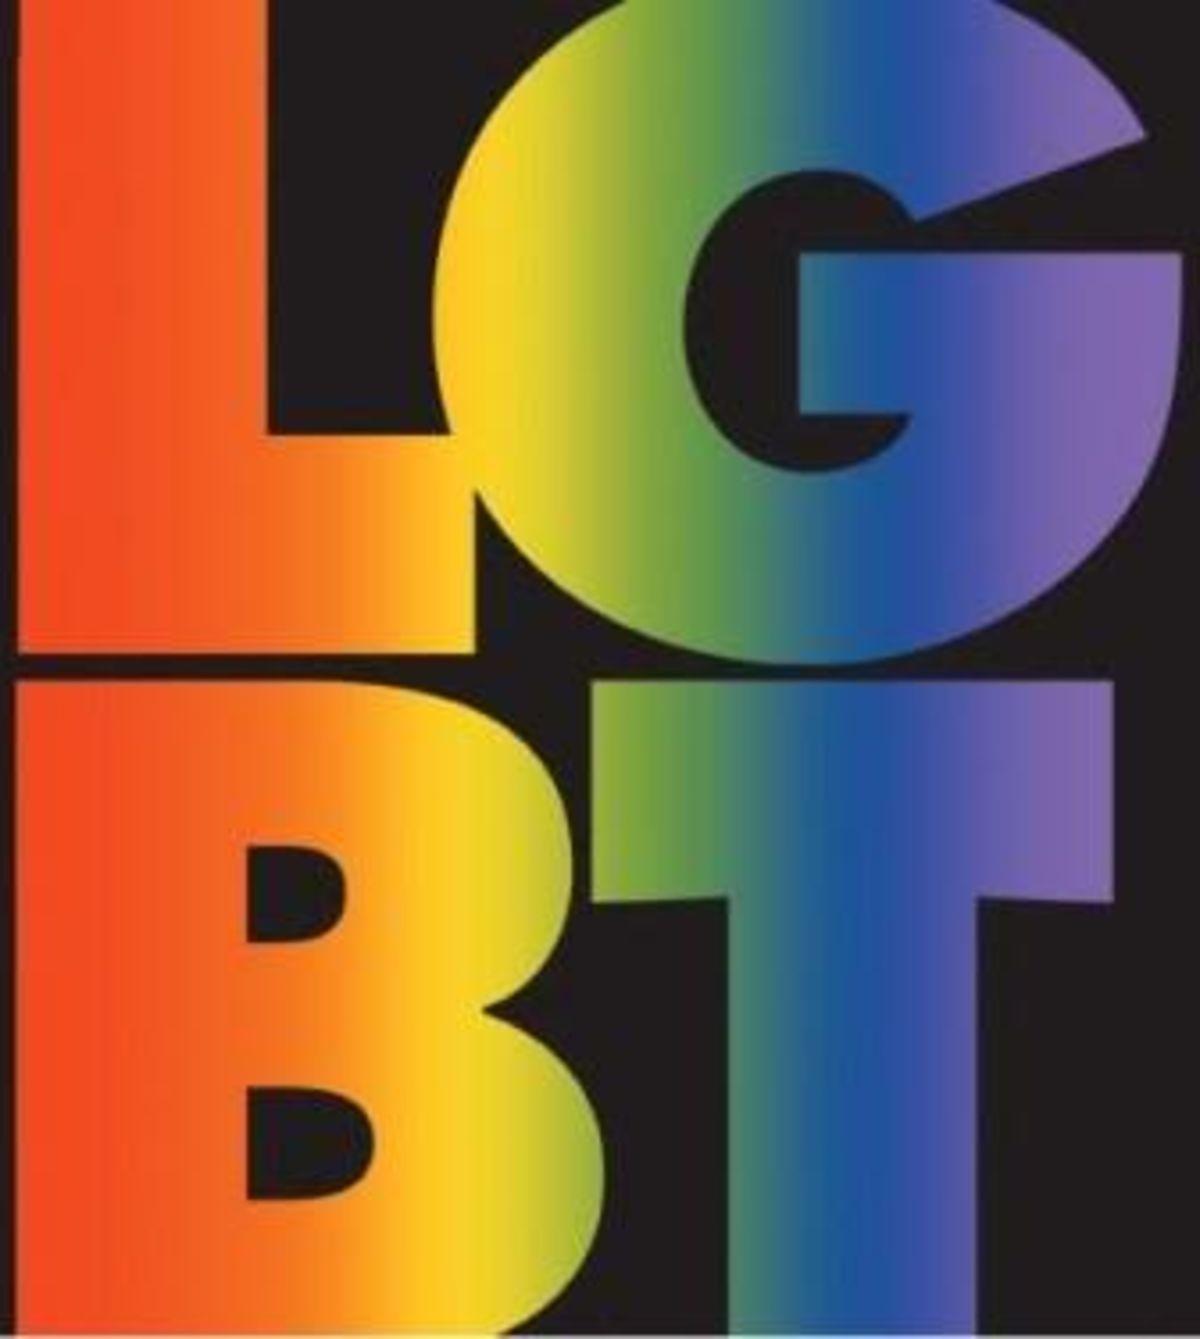 Lesbische dating sites ky